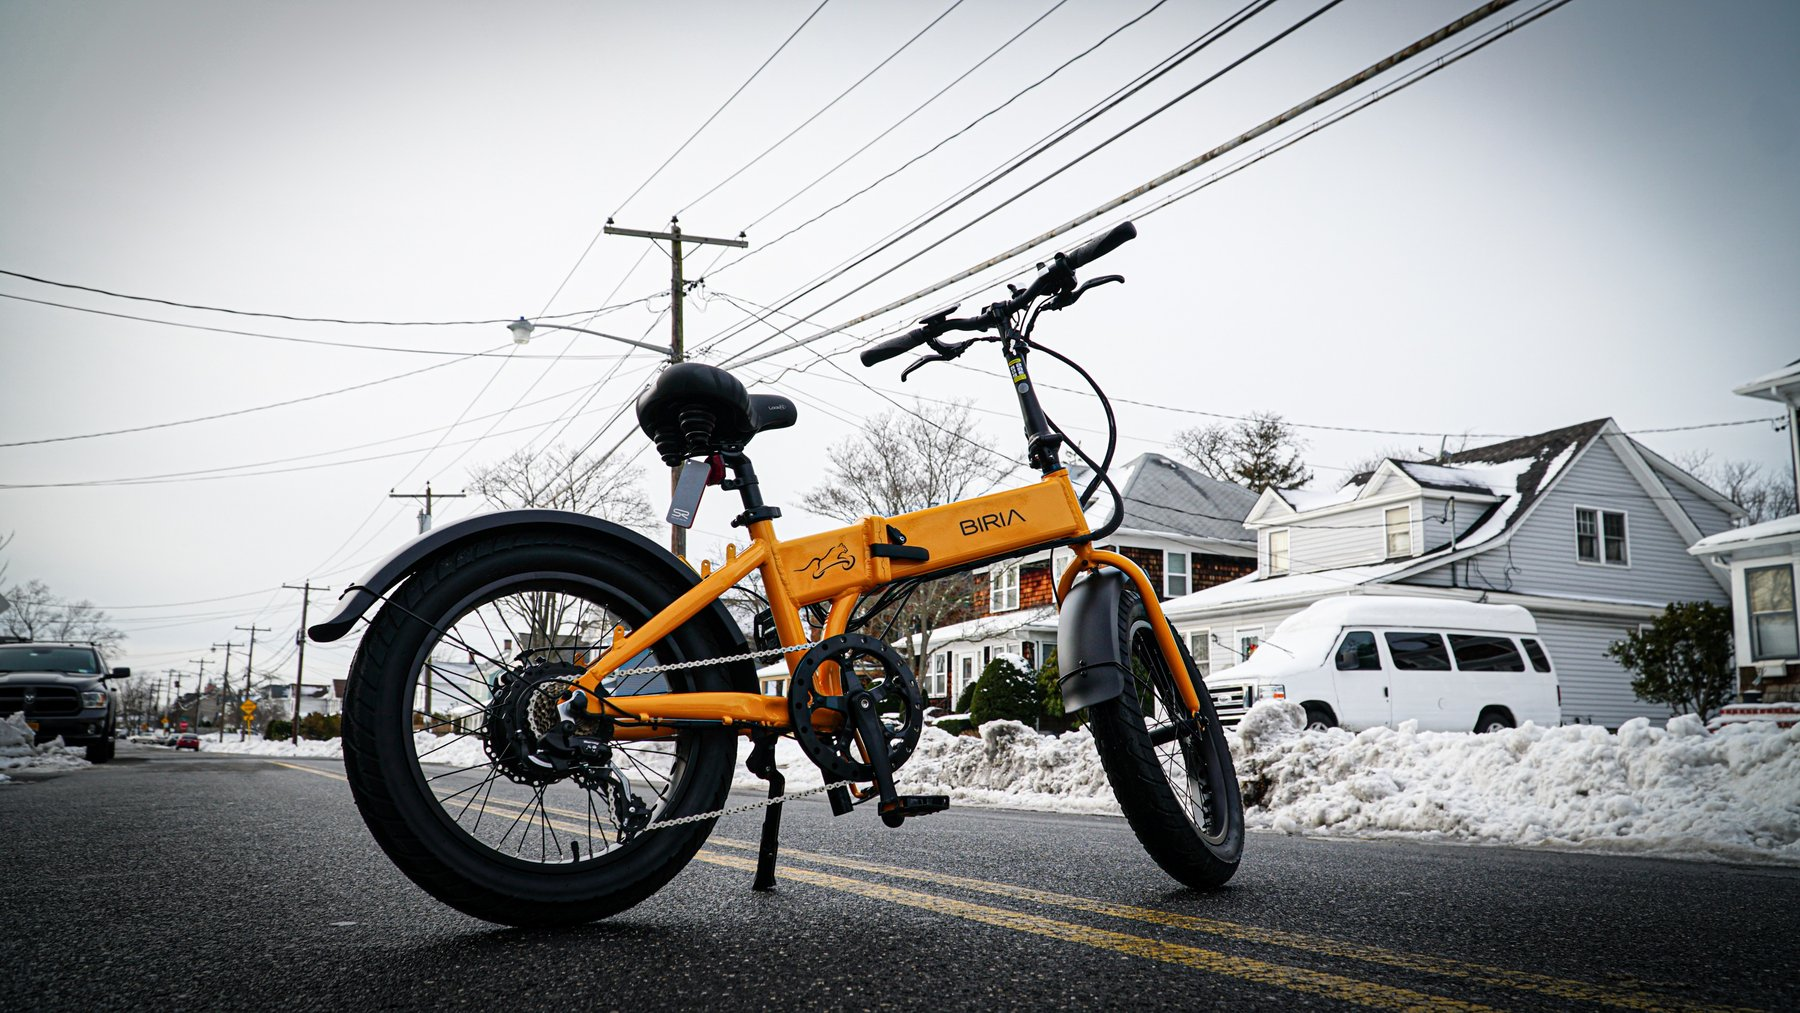 Biria Bikes e-bikes are made for city travelers